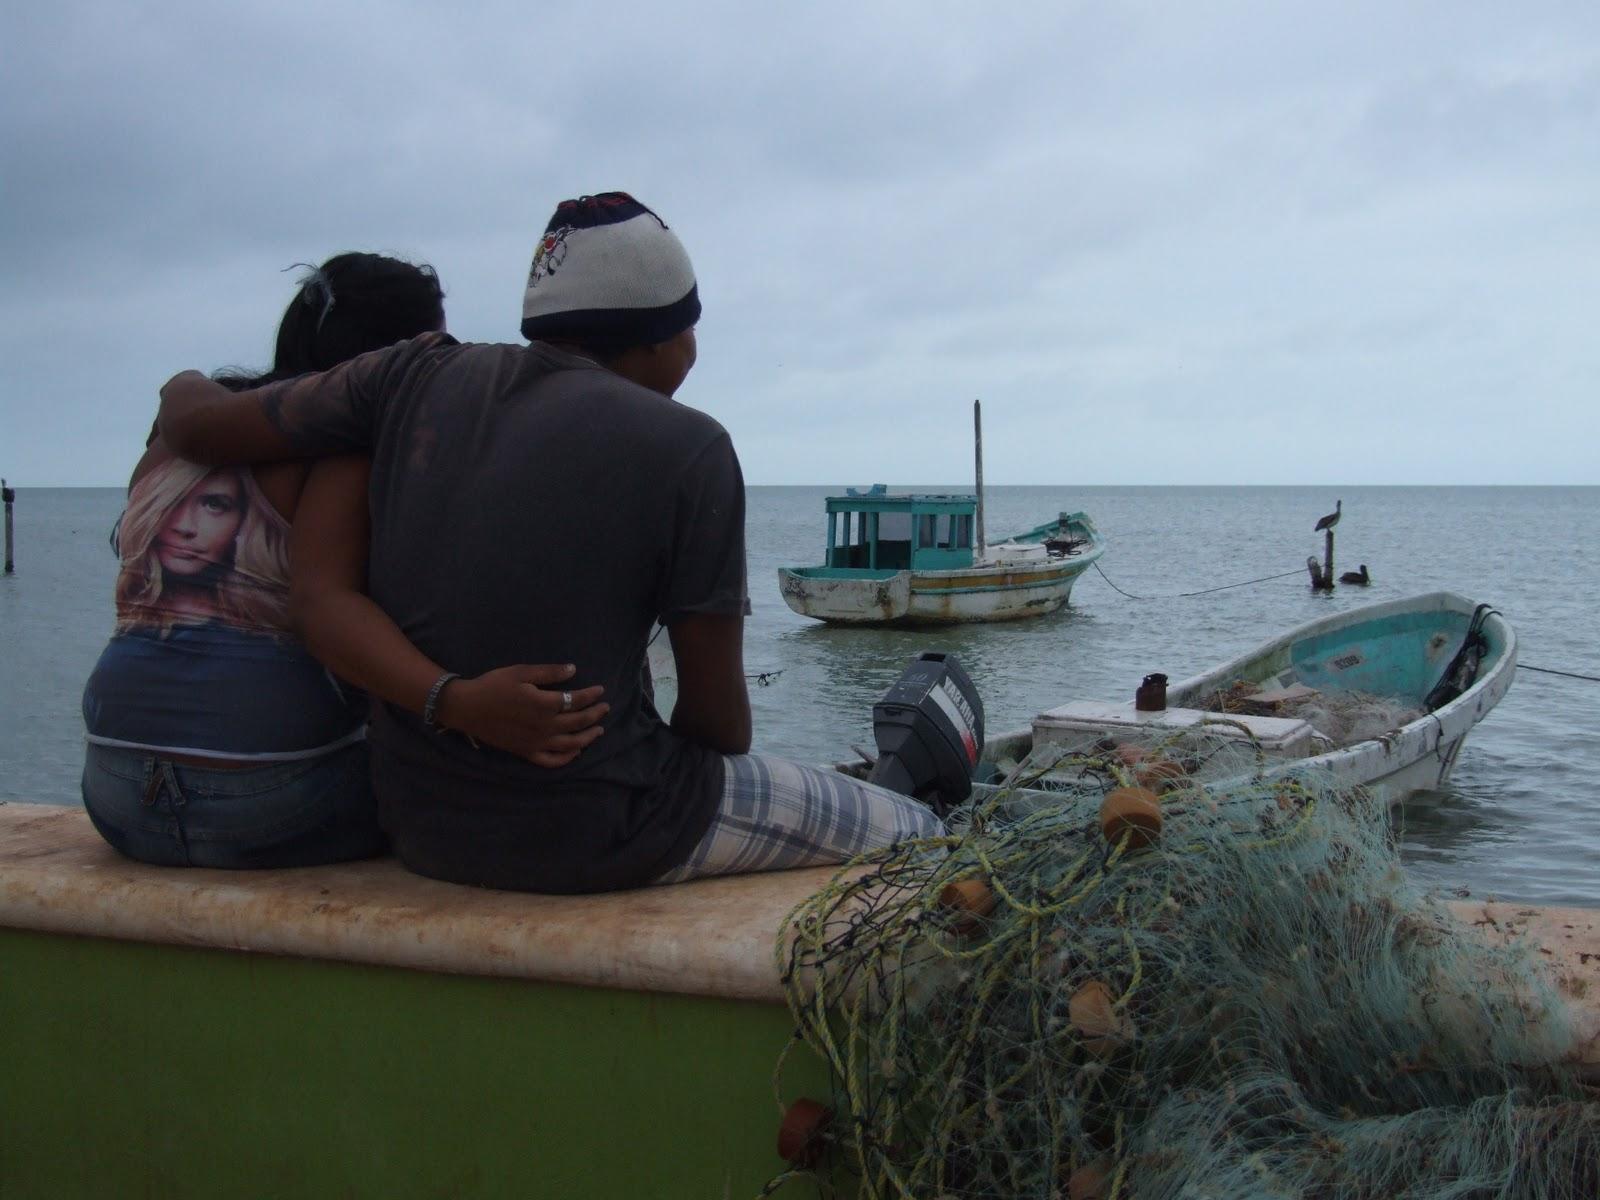 putas megaplaza redes de pesca